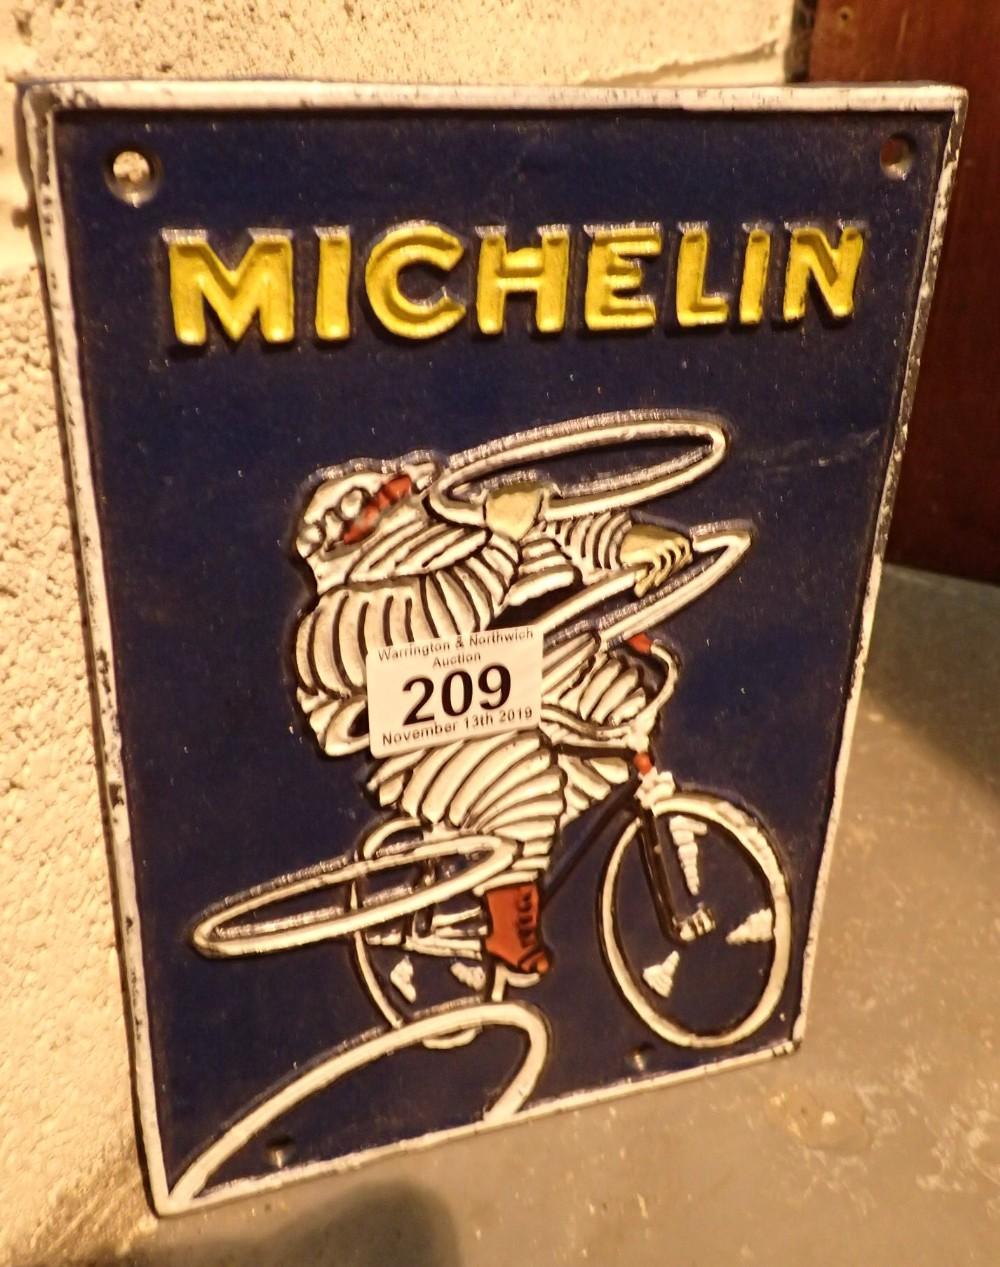 Lot 209 - Cast iron Michelin Man sign 25 x 18 cm